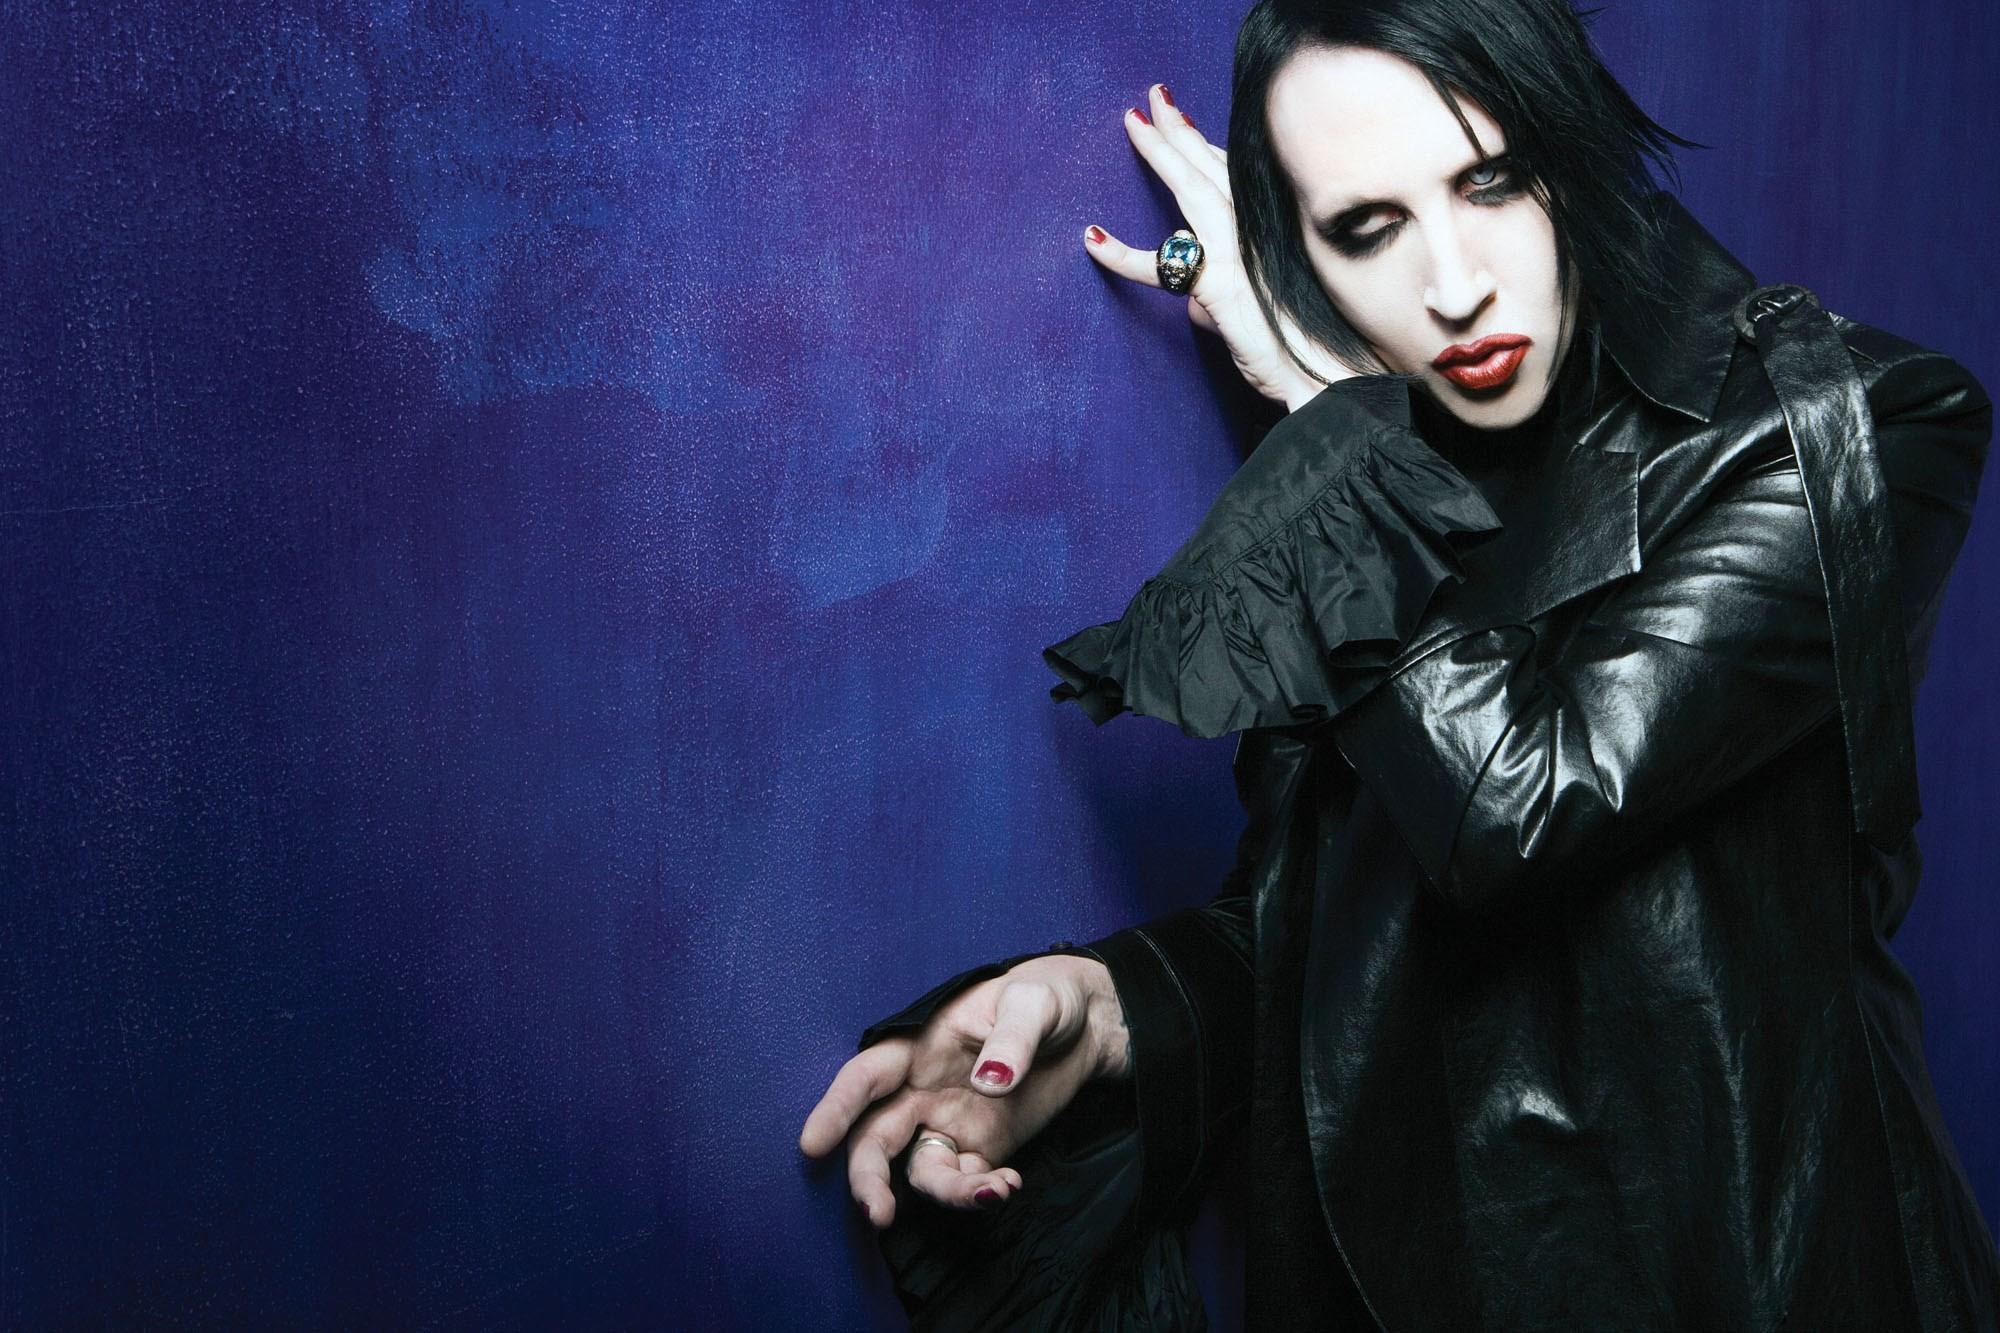 114 Marilyn Manson Wallpaper Hd